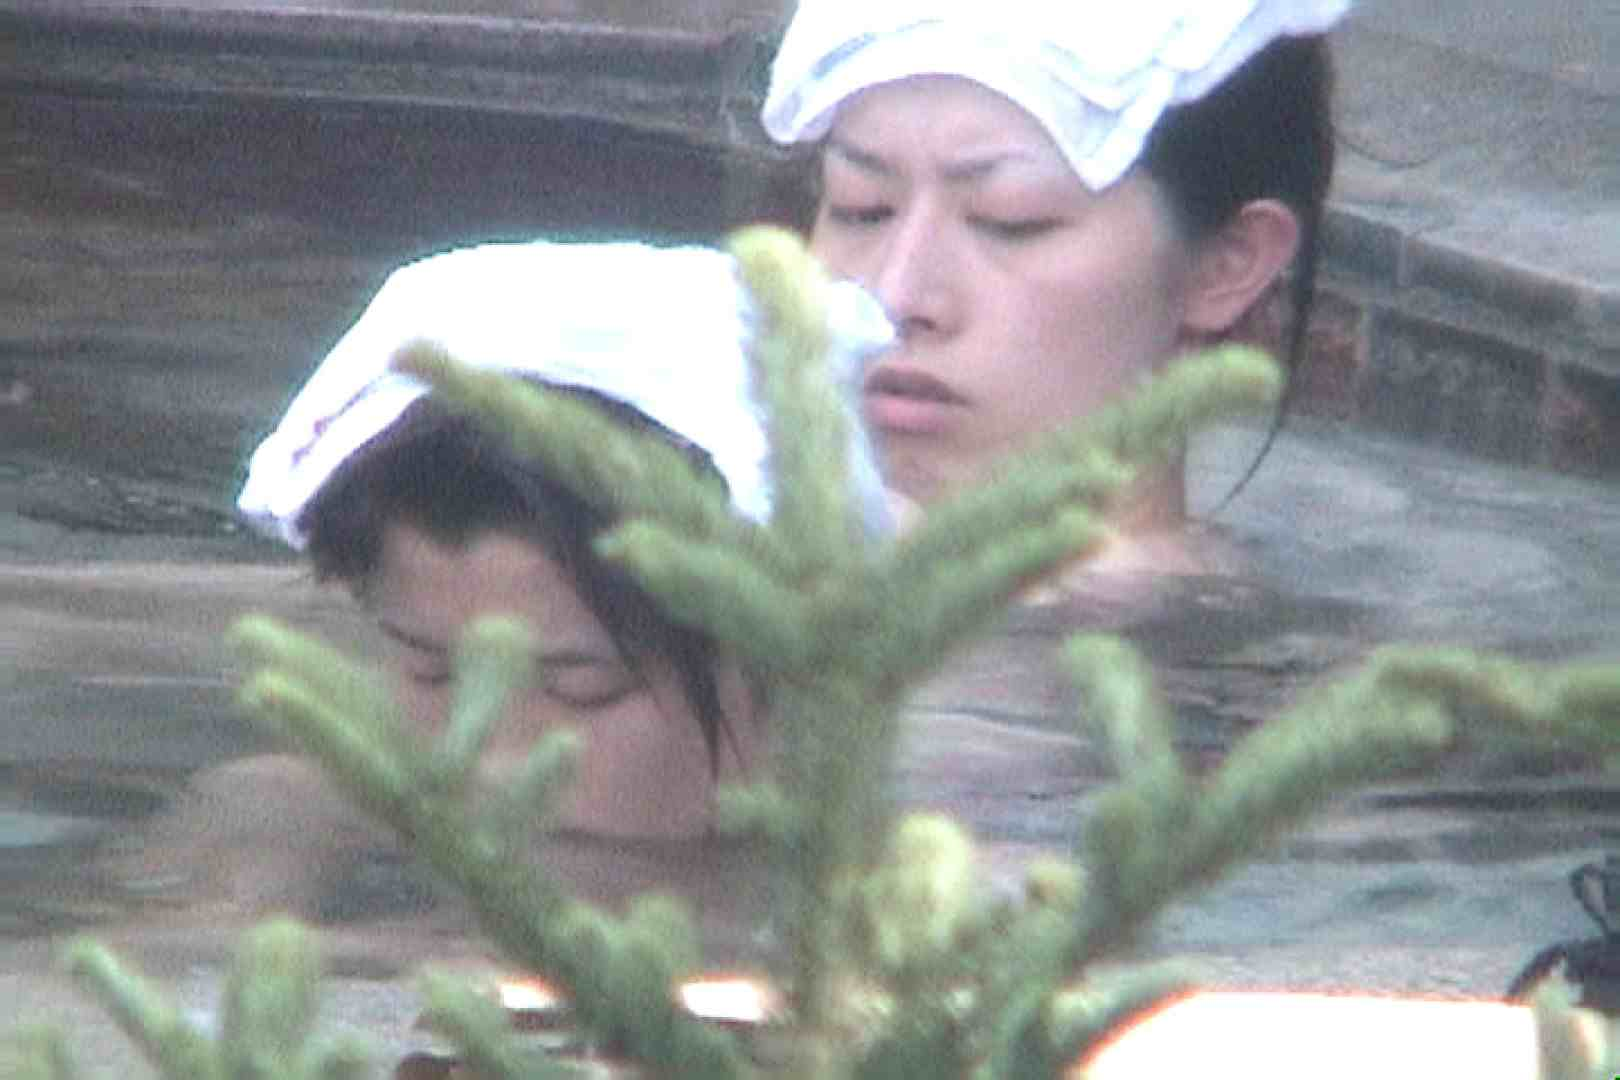 Aquaな露天風呂Vol.80【VIP限定】 露天風呂編  76PIX 56